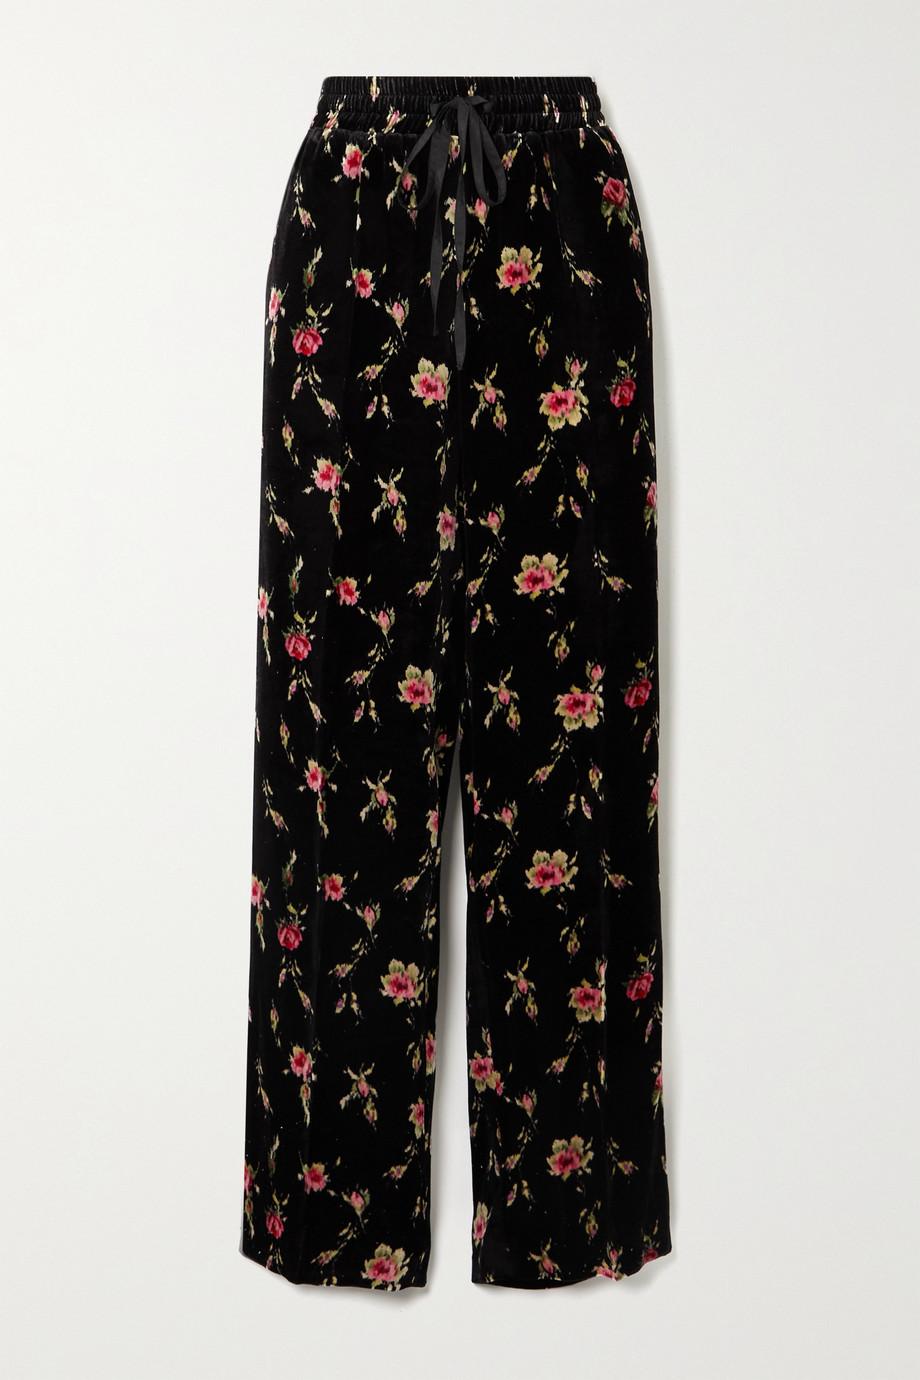 REDValentino Pantalon large en velours à imprimé fleuri